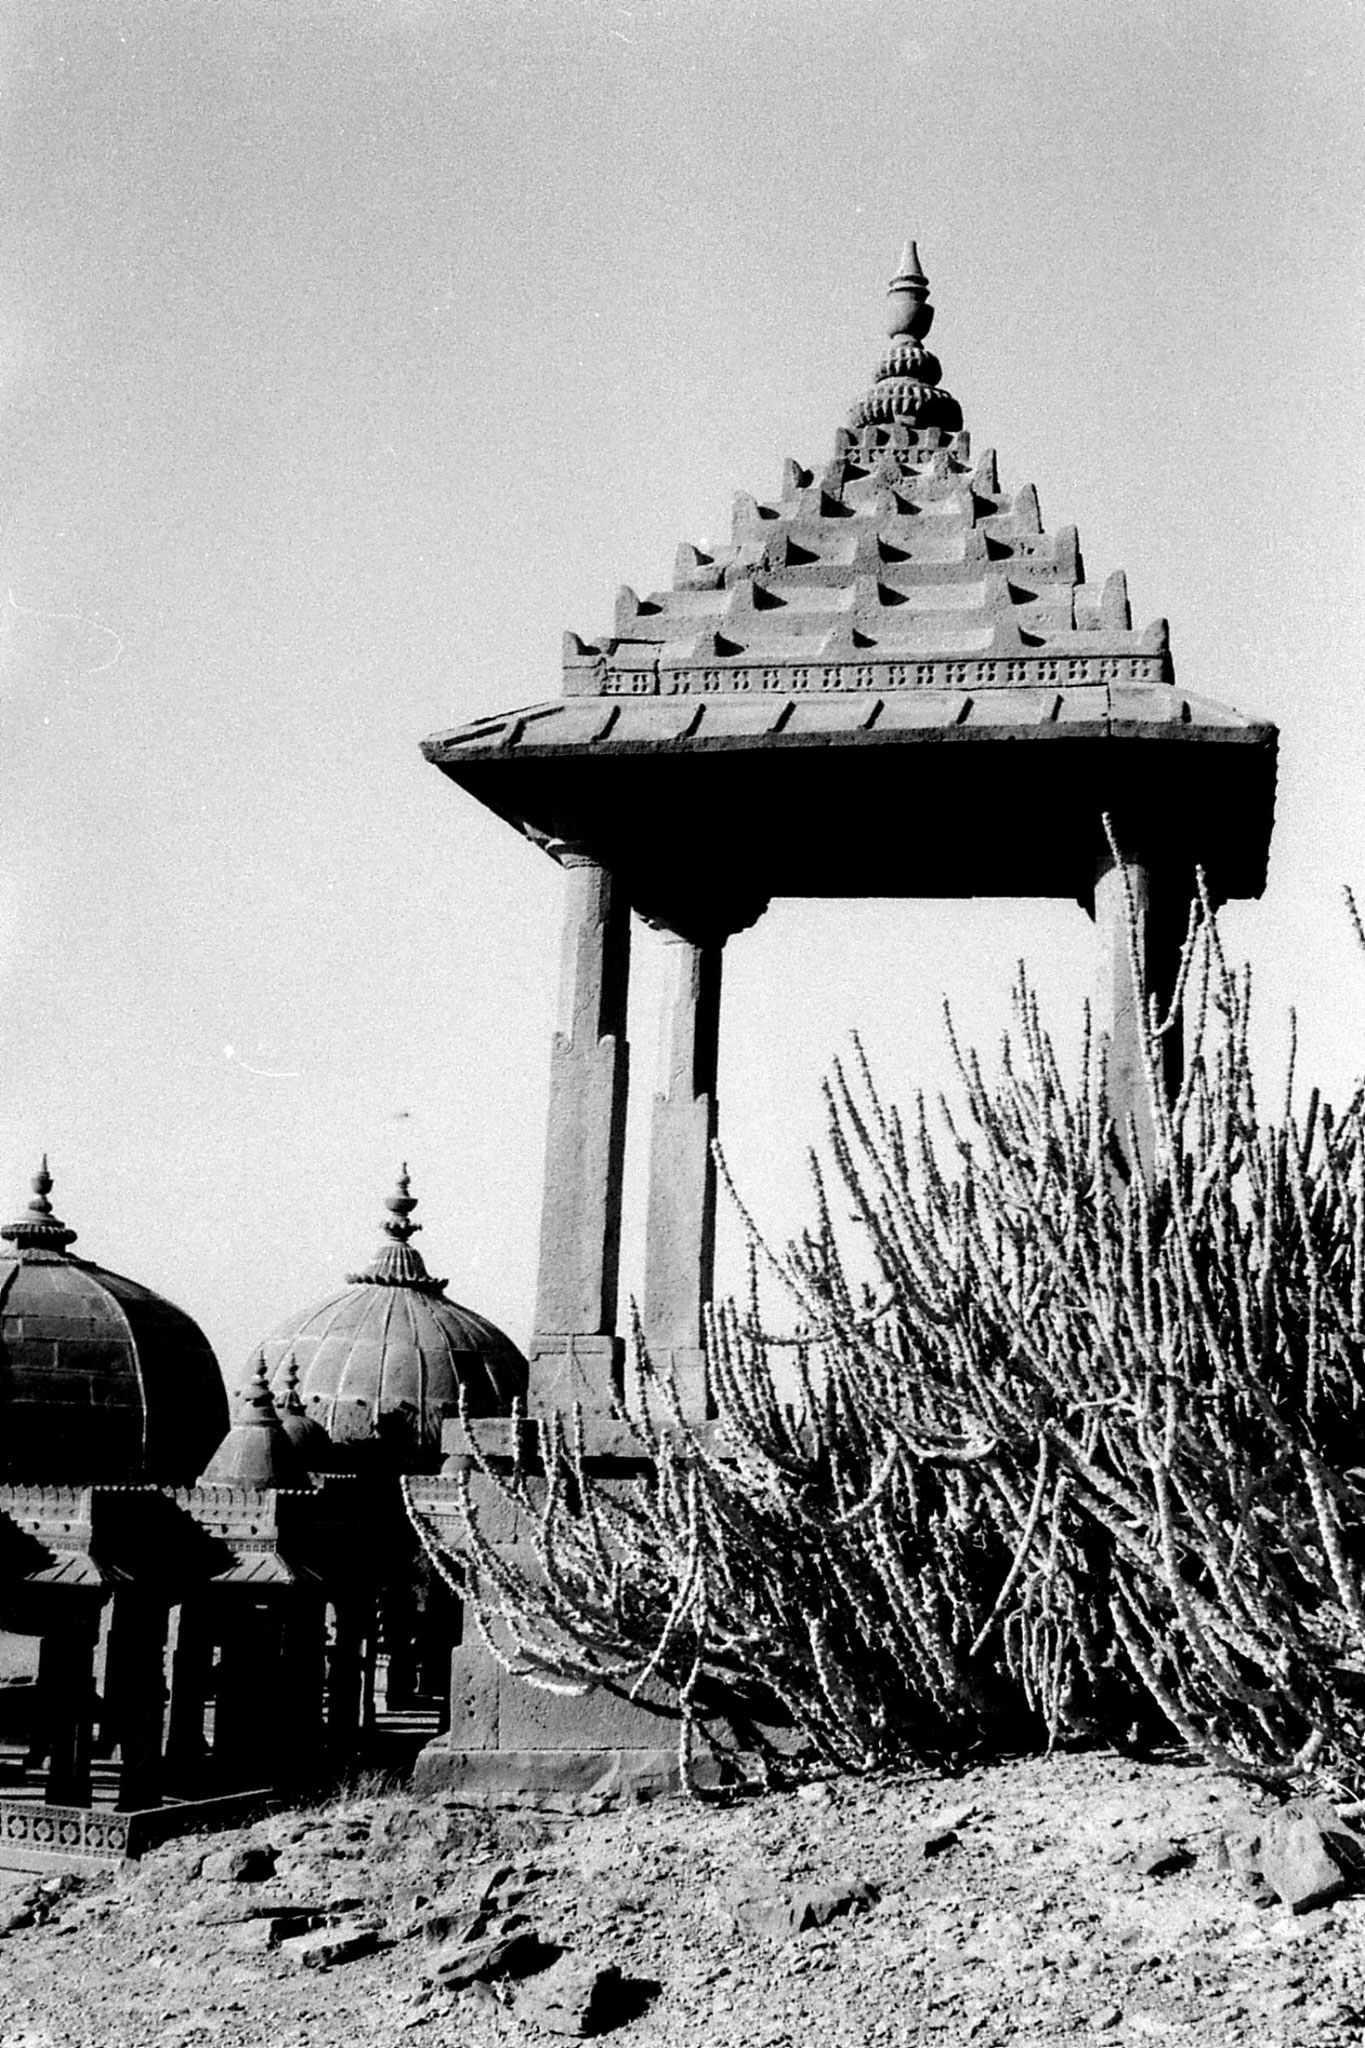 4/12/1989: 3: Jaisalmer cenotaph